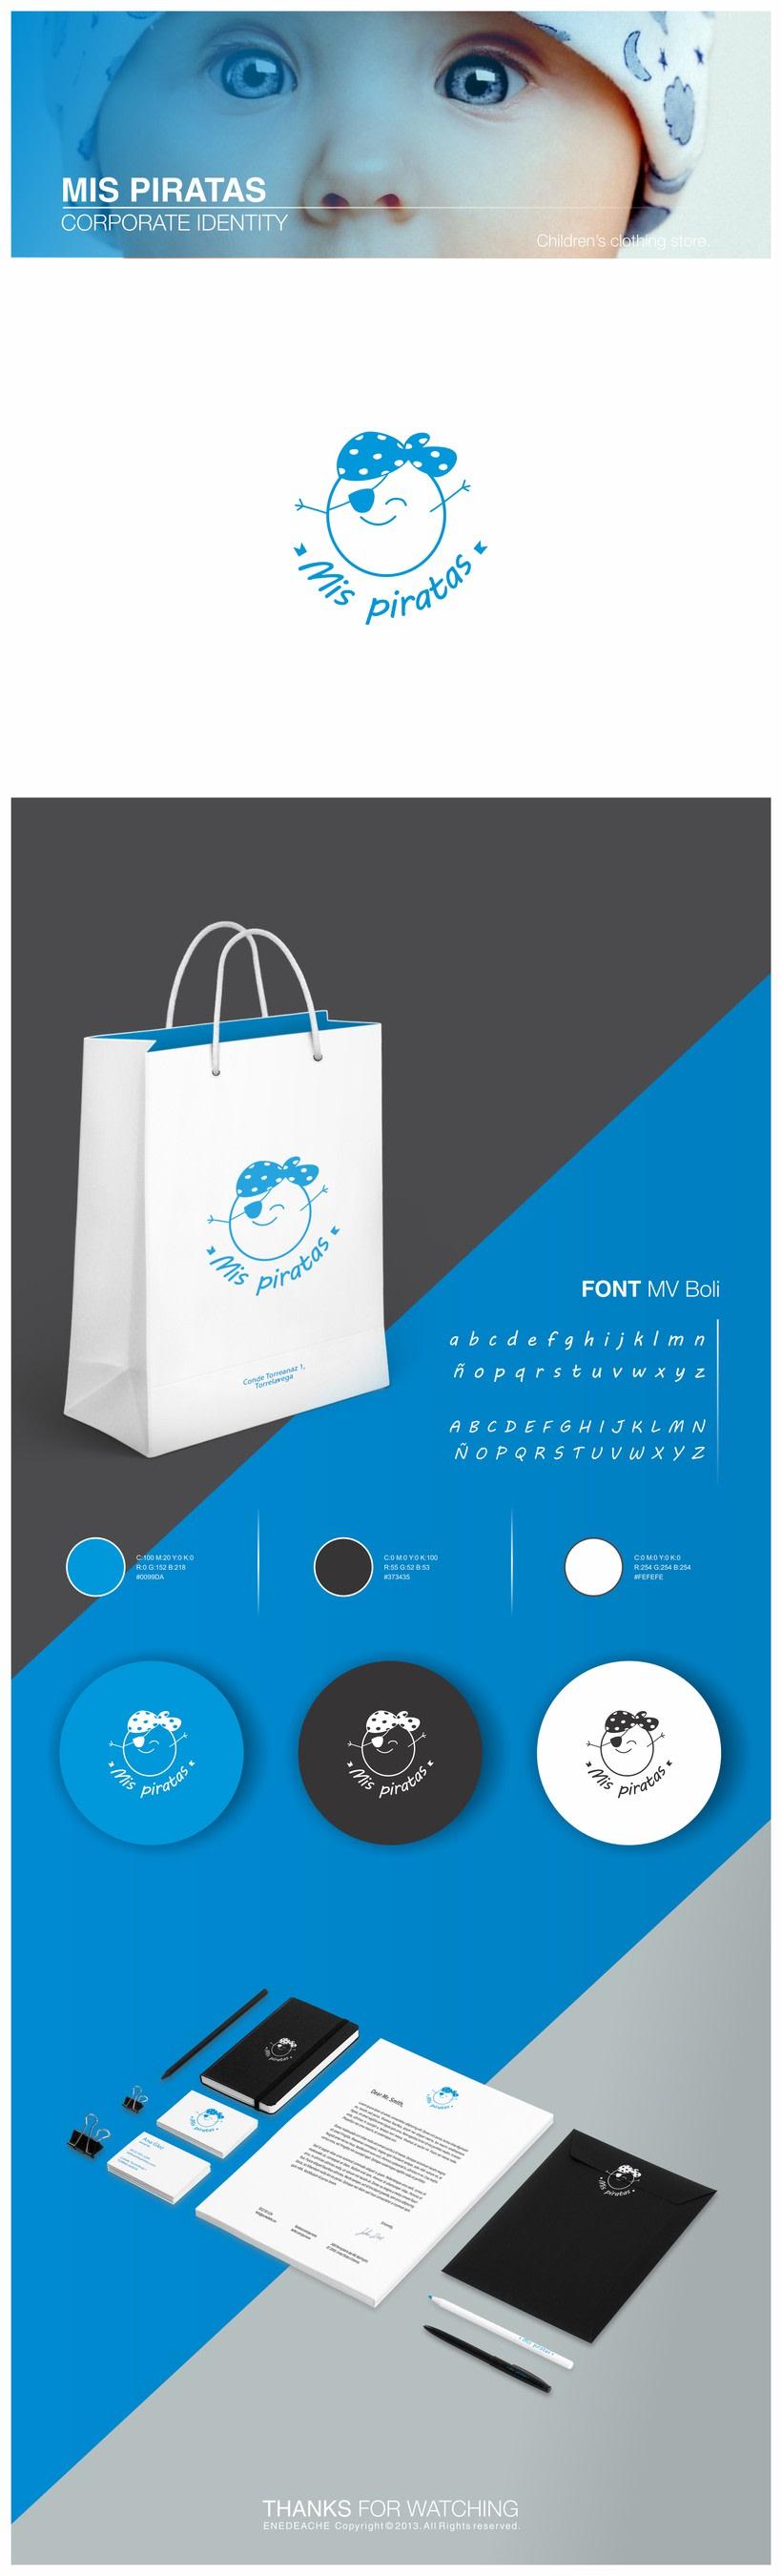 MIS PIRATAS // Corporate identity -1